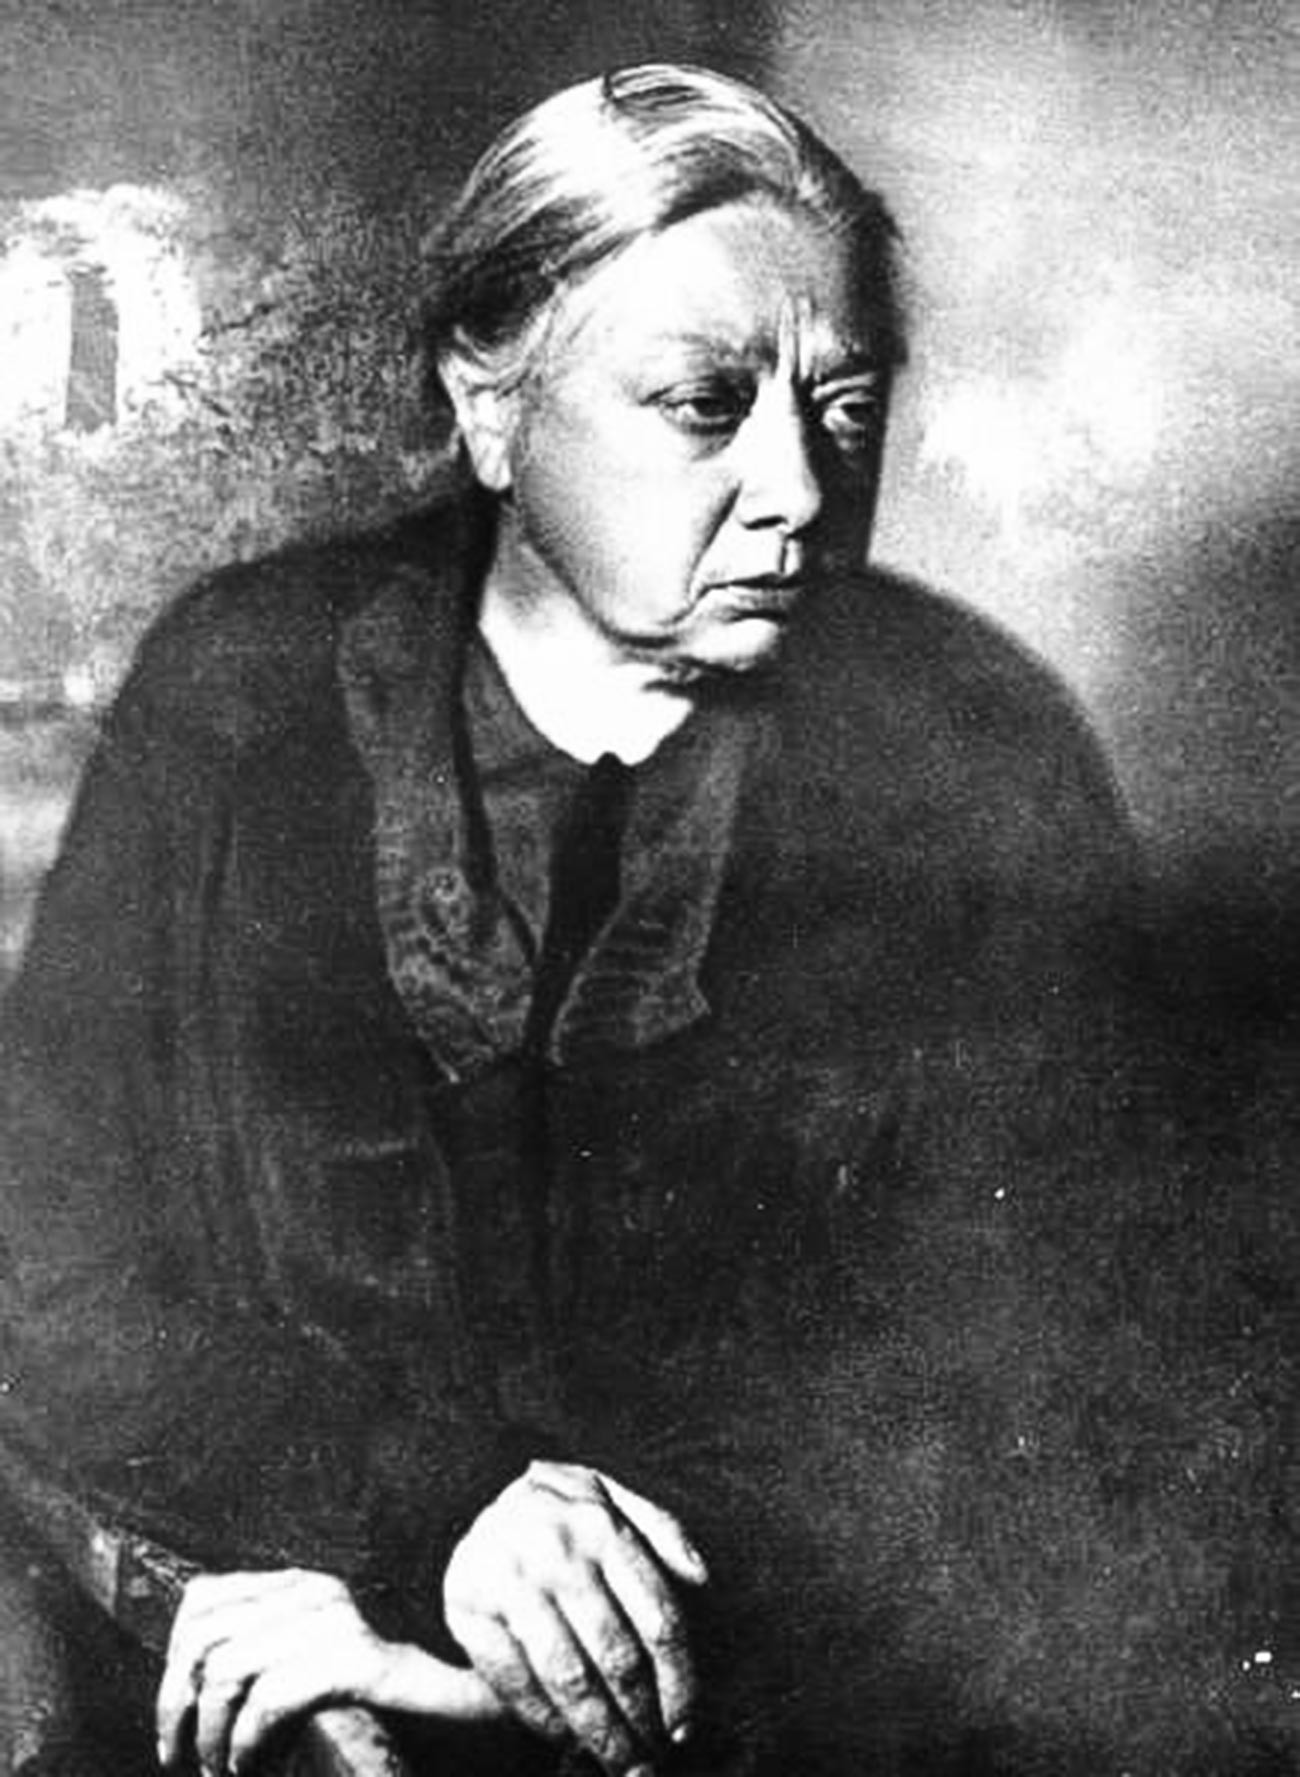 Nadiezhda Krúpskaia, esposa de Lenin y revolucionaria, 1932